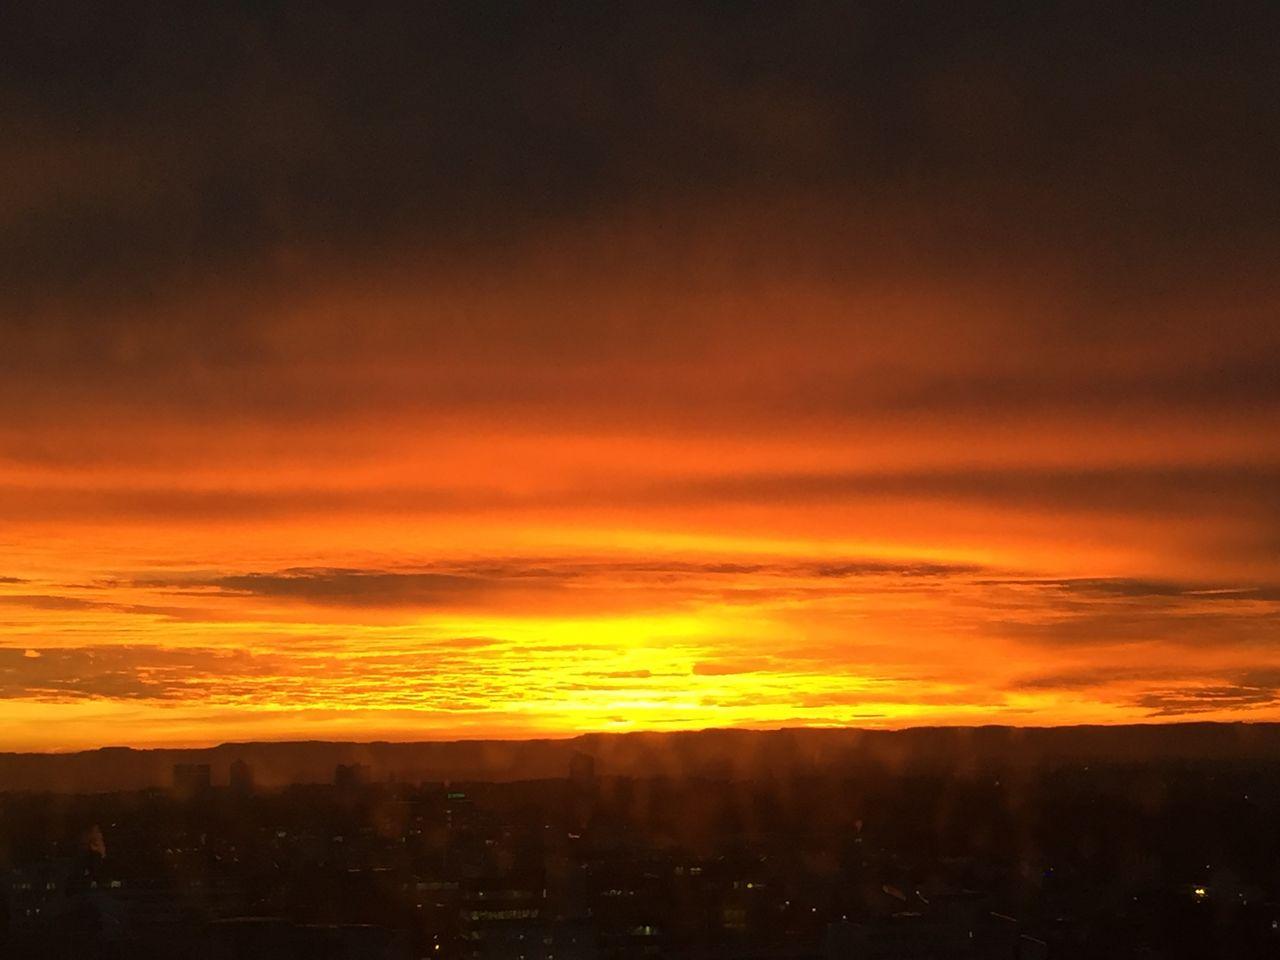 Sonnenaufgang 23.11. IMG_7526